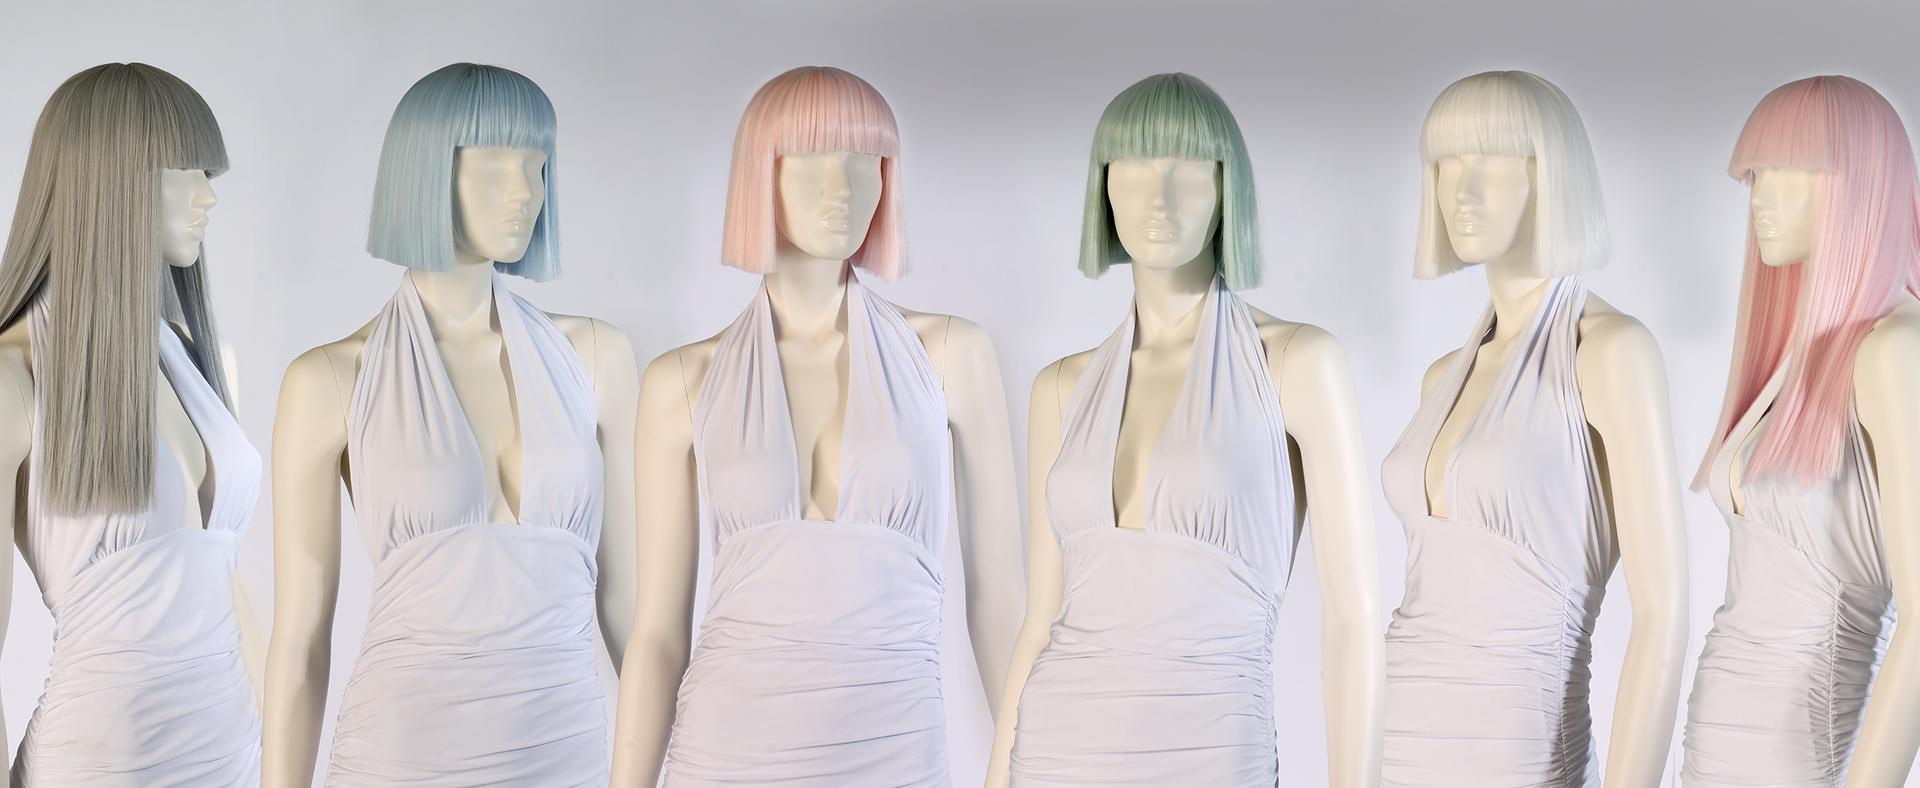 hindsgaul_mannaquins_wigs-2